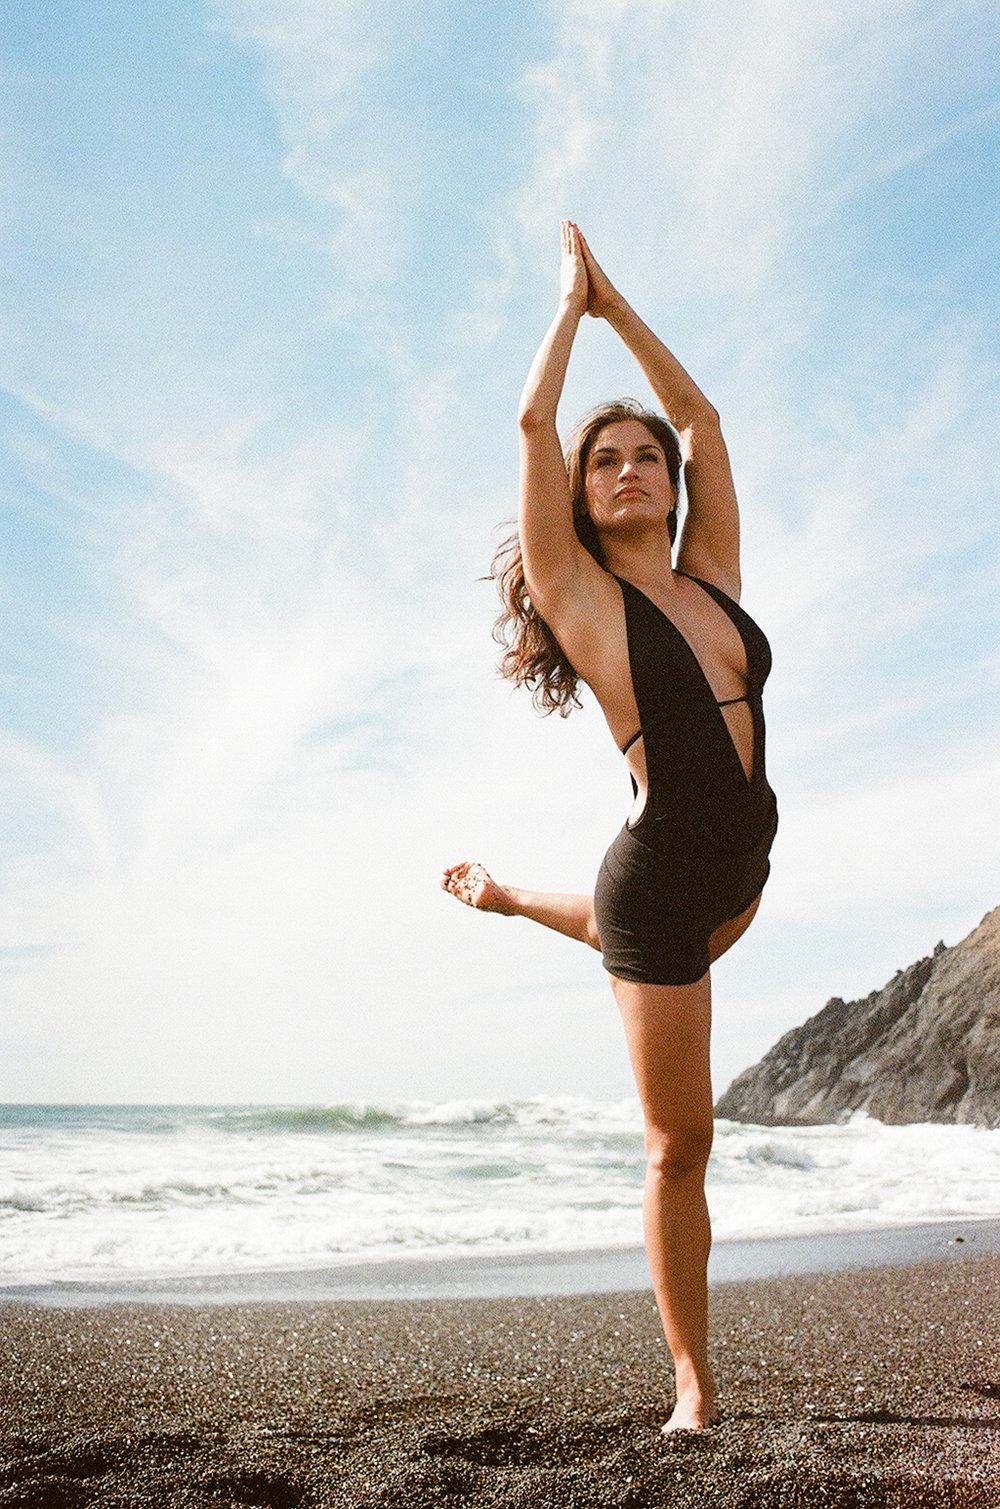 Nadia_Pilates-14.JPG